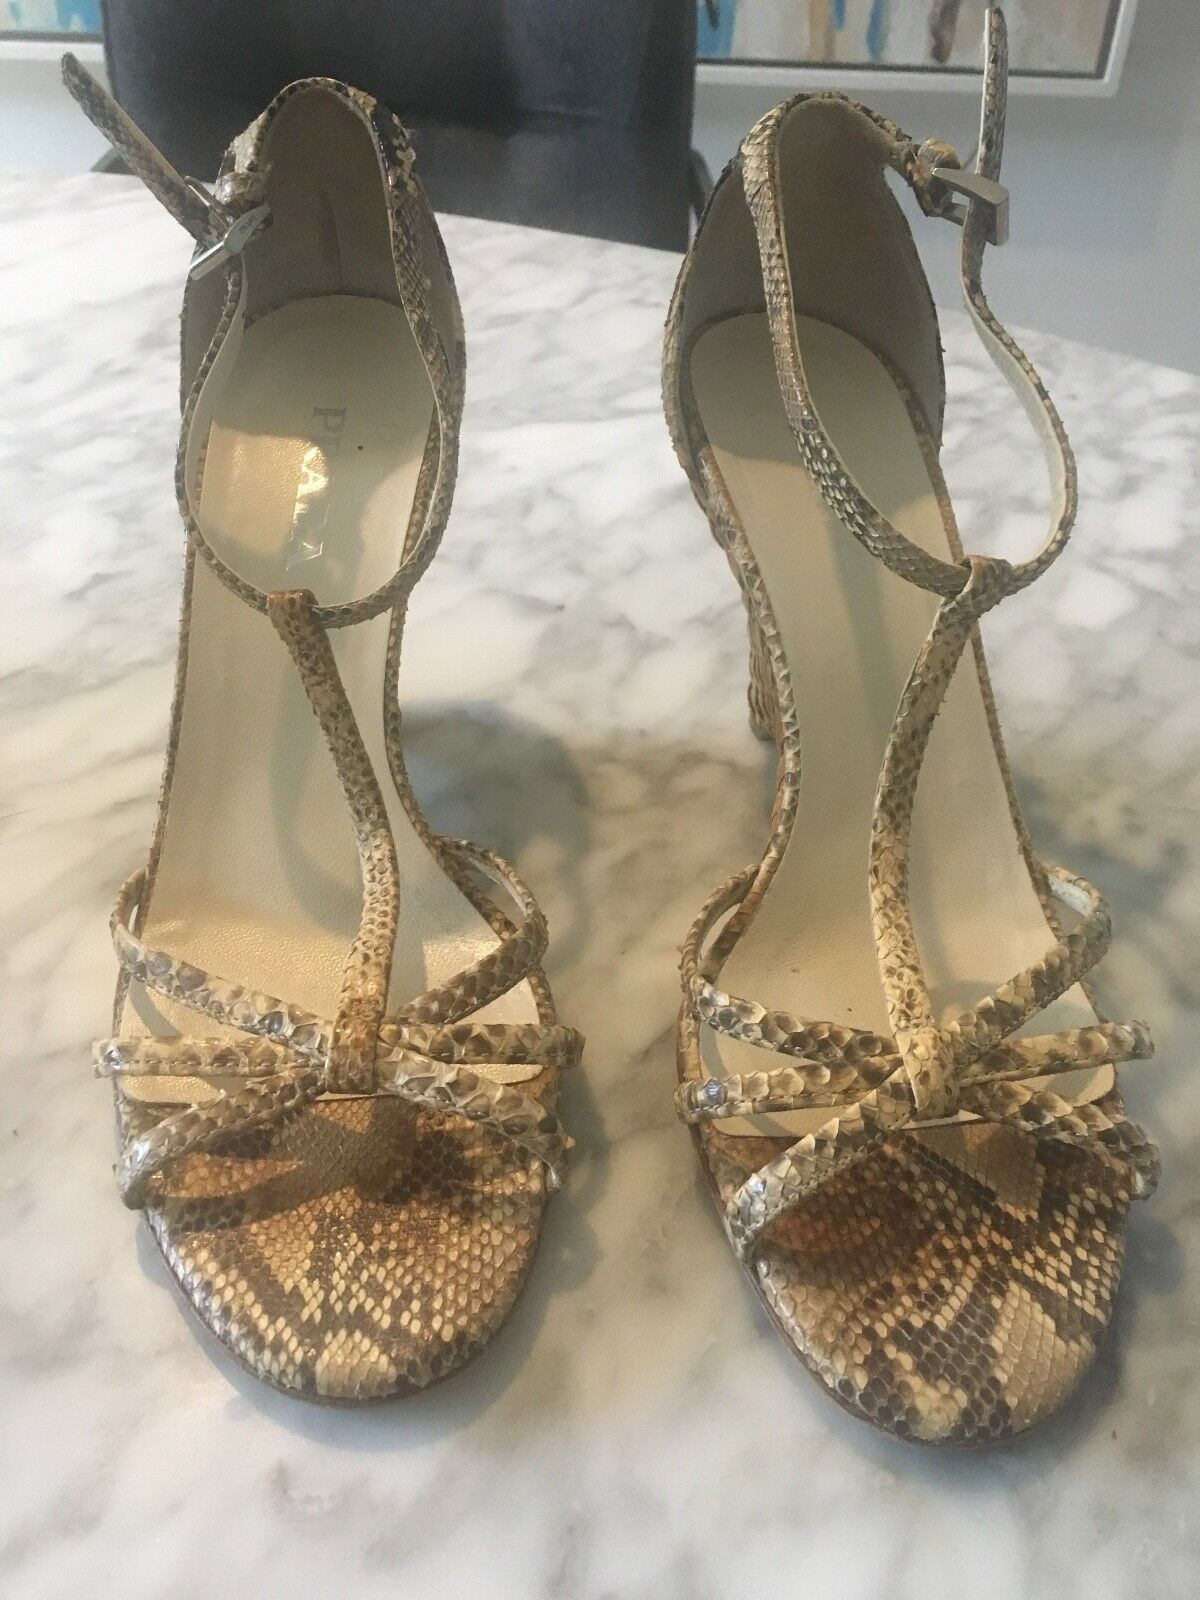 PRADA Python Ankle Strap Wedge High Heel Sandal shoes Size IT 39